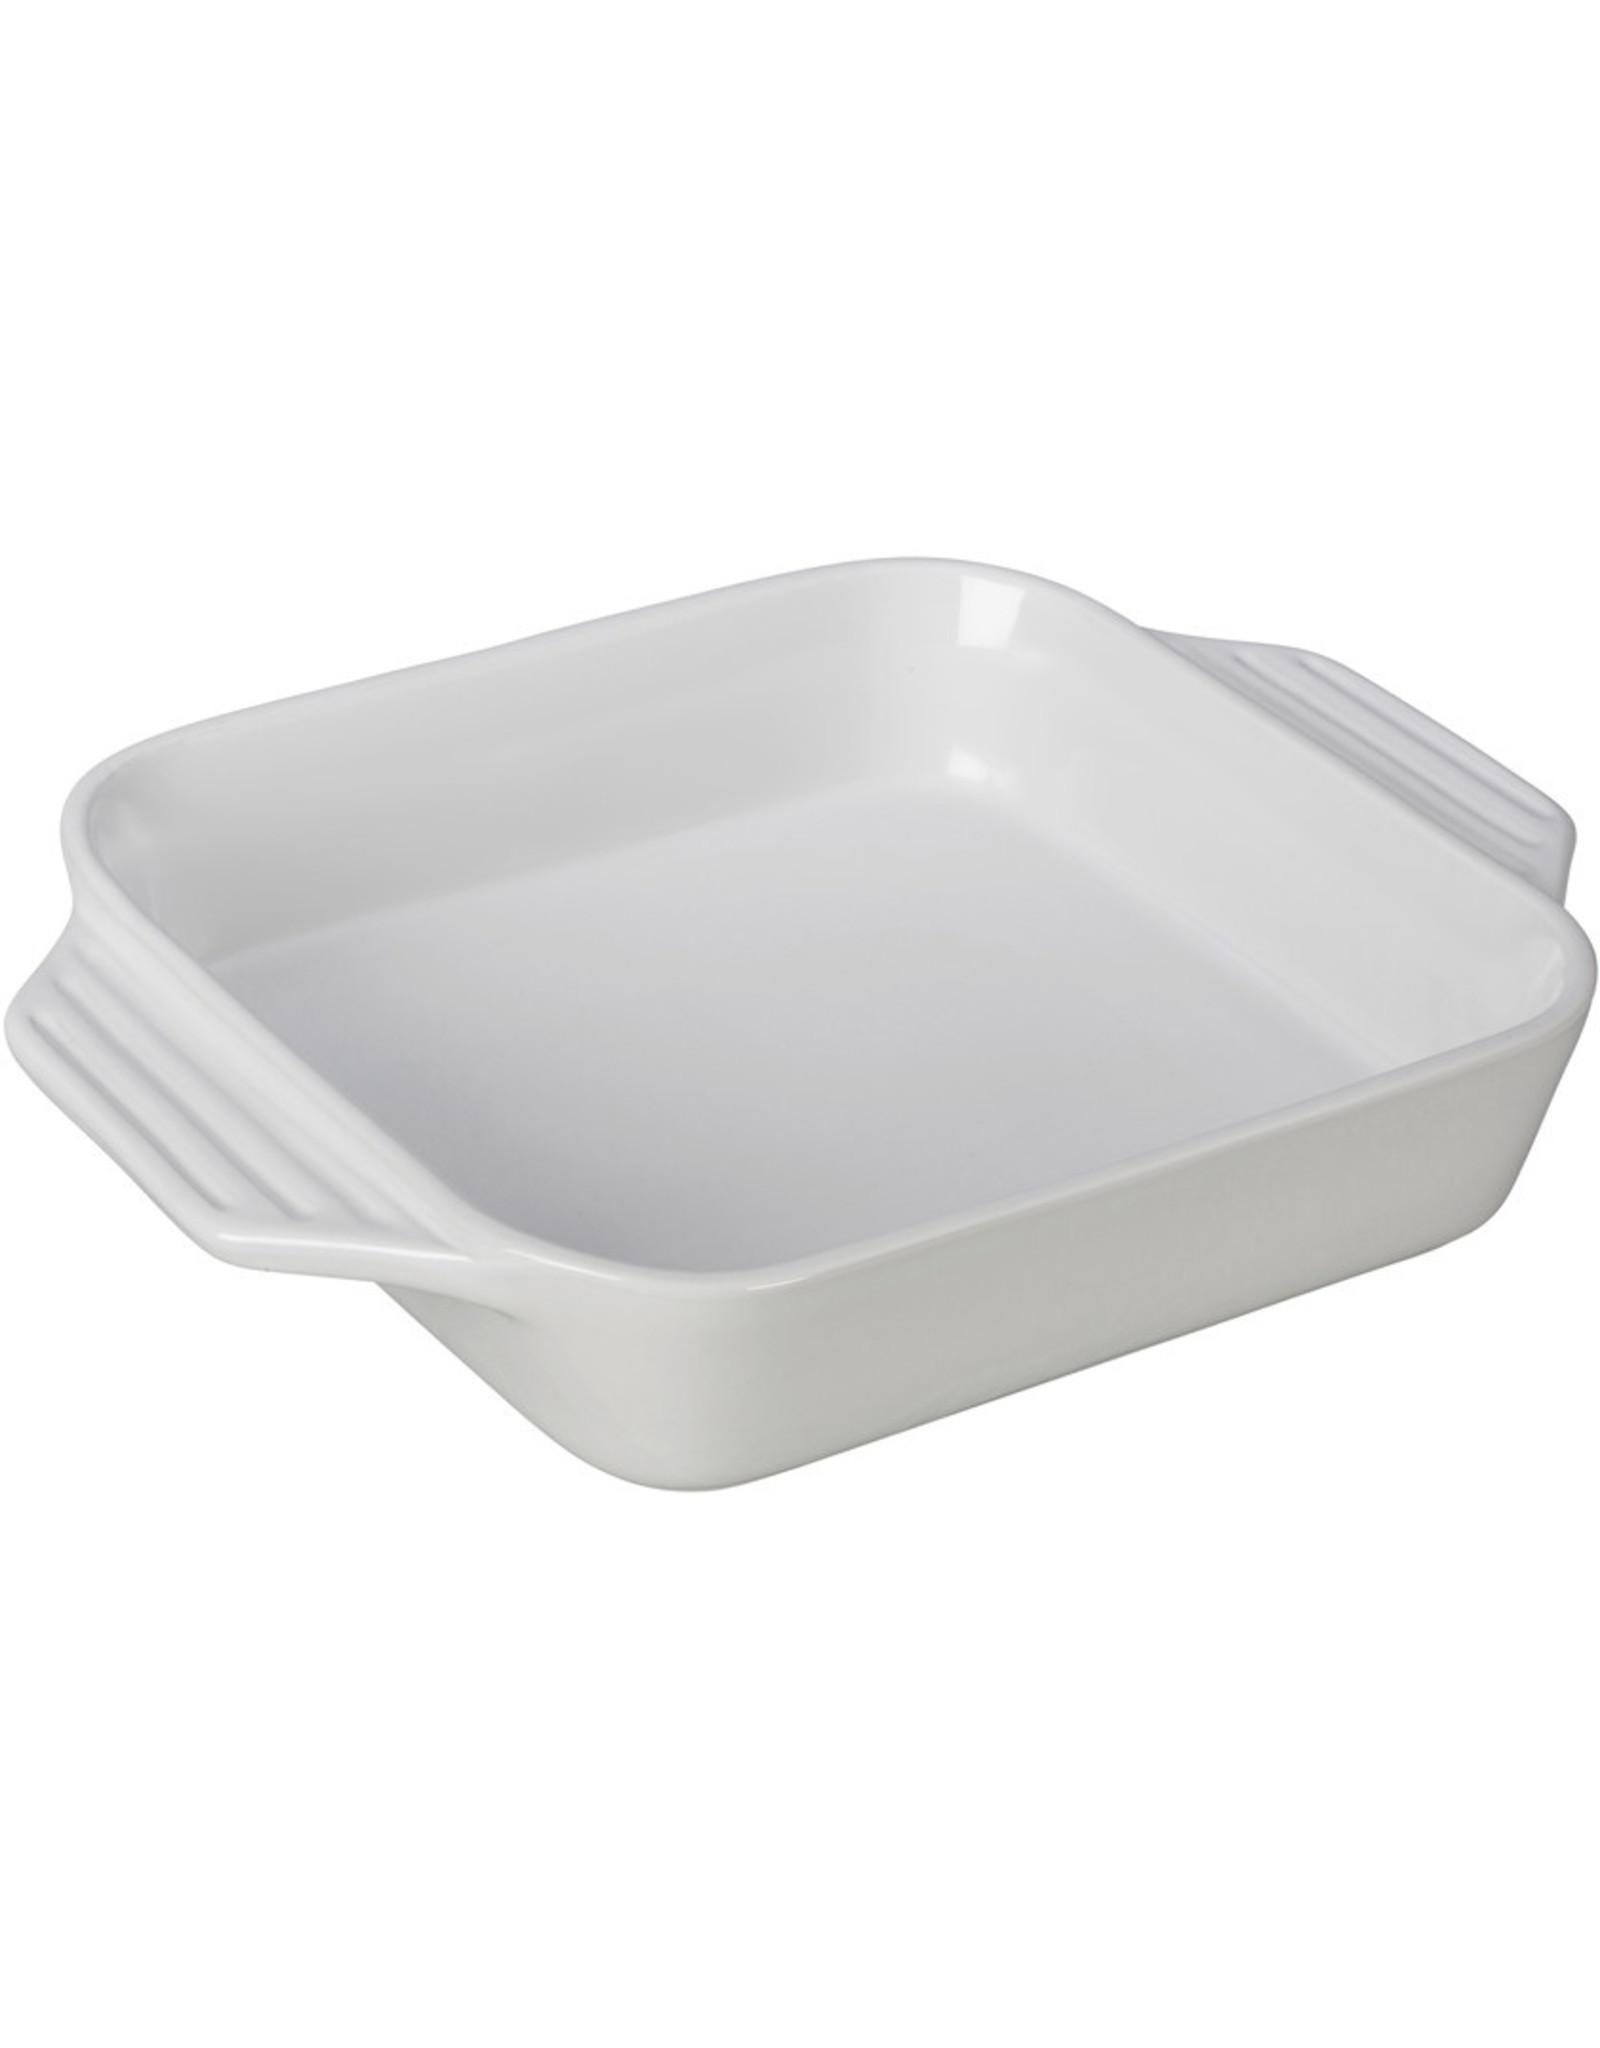 "Le Creuset Le Creuset 9.5"" Square Dish White"